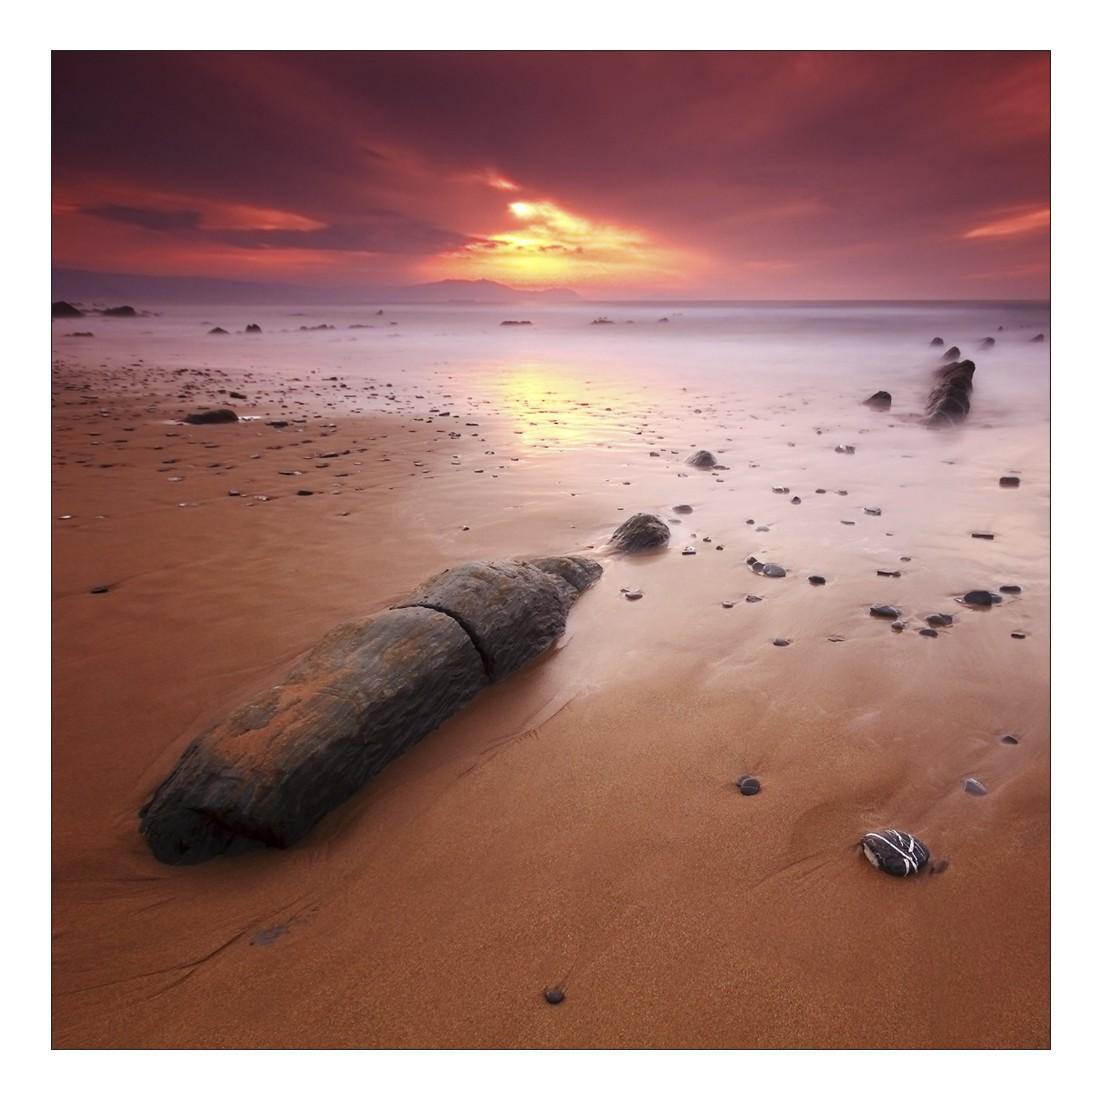 Leinwandbild BURNING SKY BEACH – Abmessung 80 x 80 cm, Gallery of Innovative Art günstig kaufen